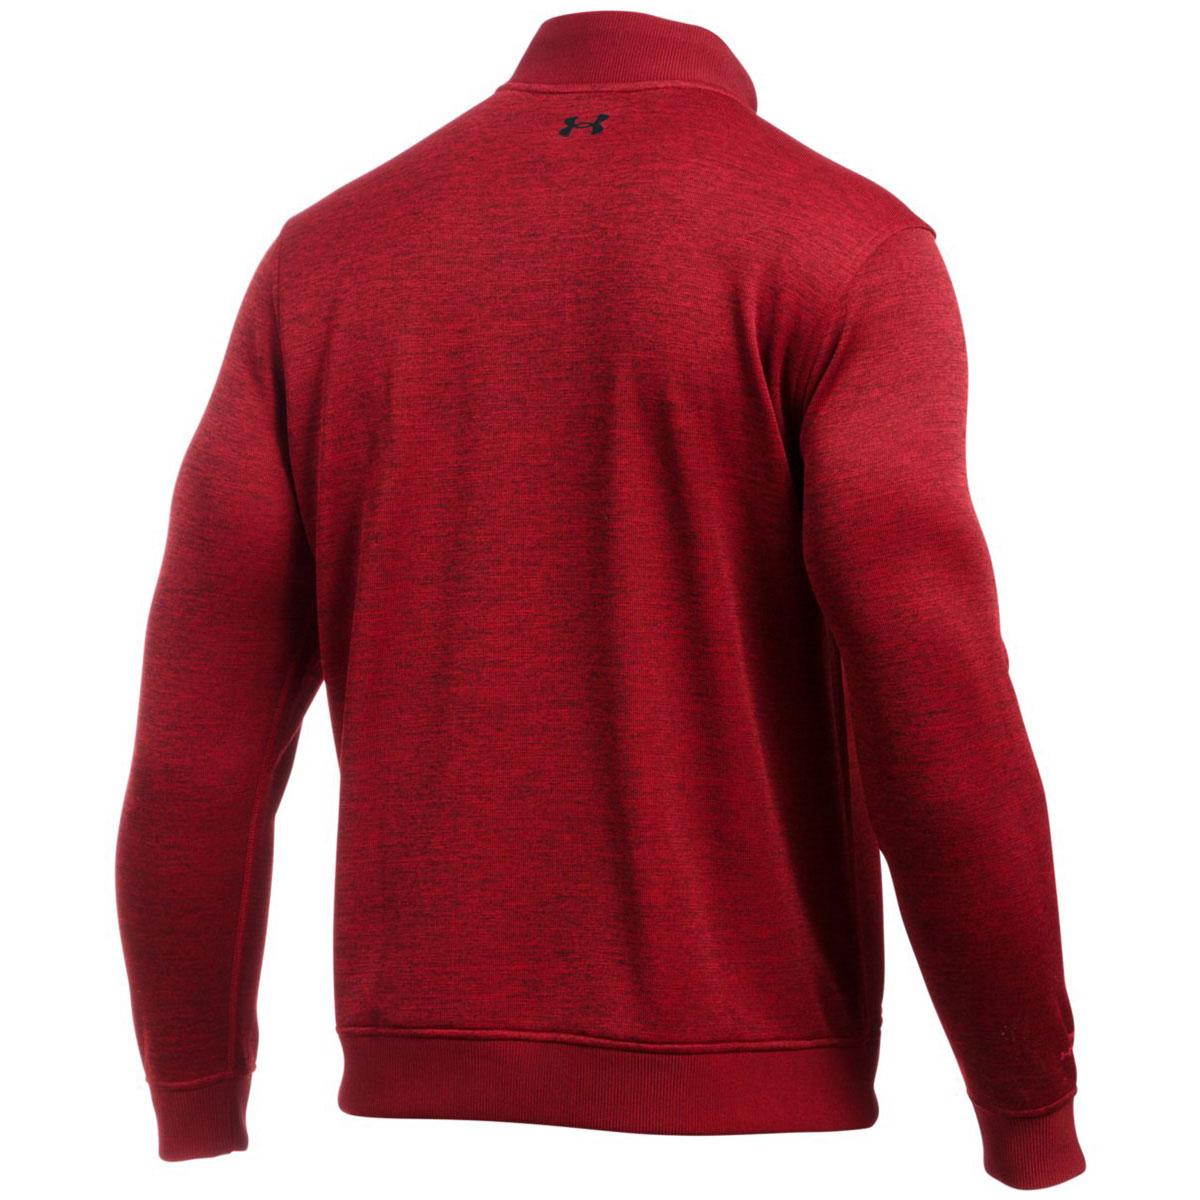 Under-Armour-Mens-UA-Storm-Sweater-Fleece-1-4-Zip-Pullover-Jumper-25-OFF-RRP thumbnail 30